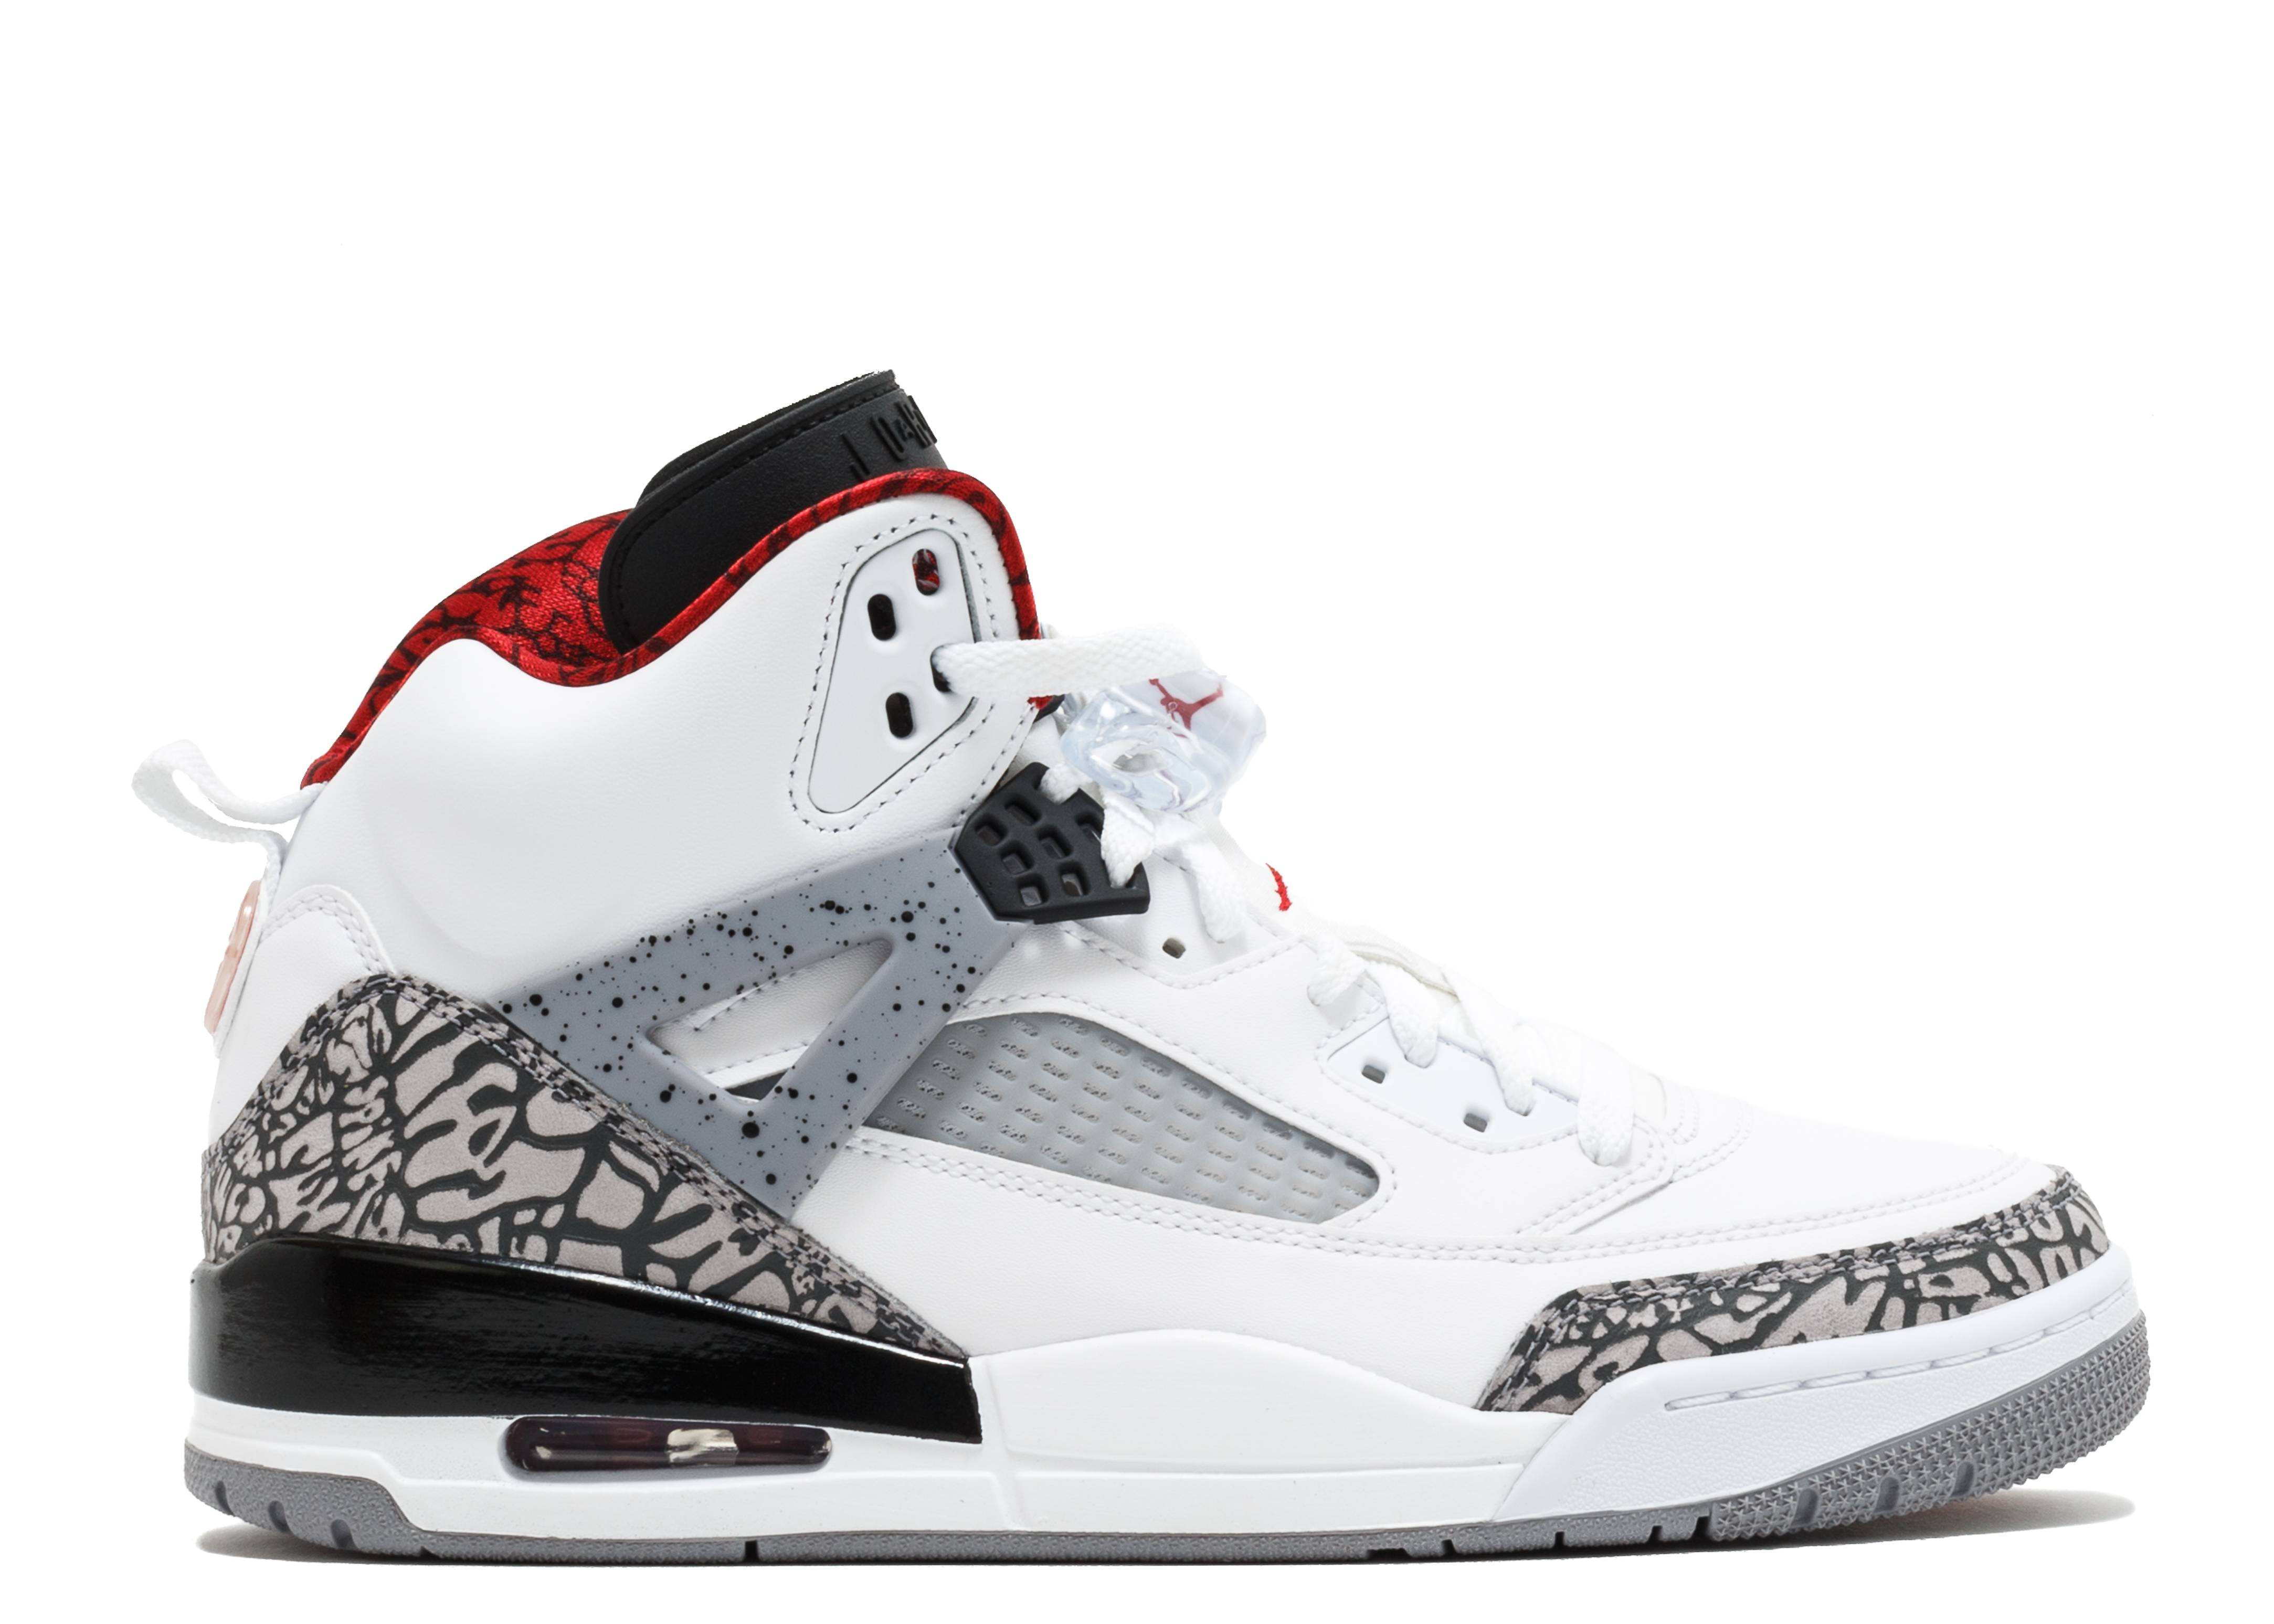 9bb2039f426aa Spizike - Air Jordan - 315371 122 - white varsity red - cement grey ...